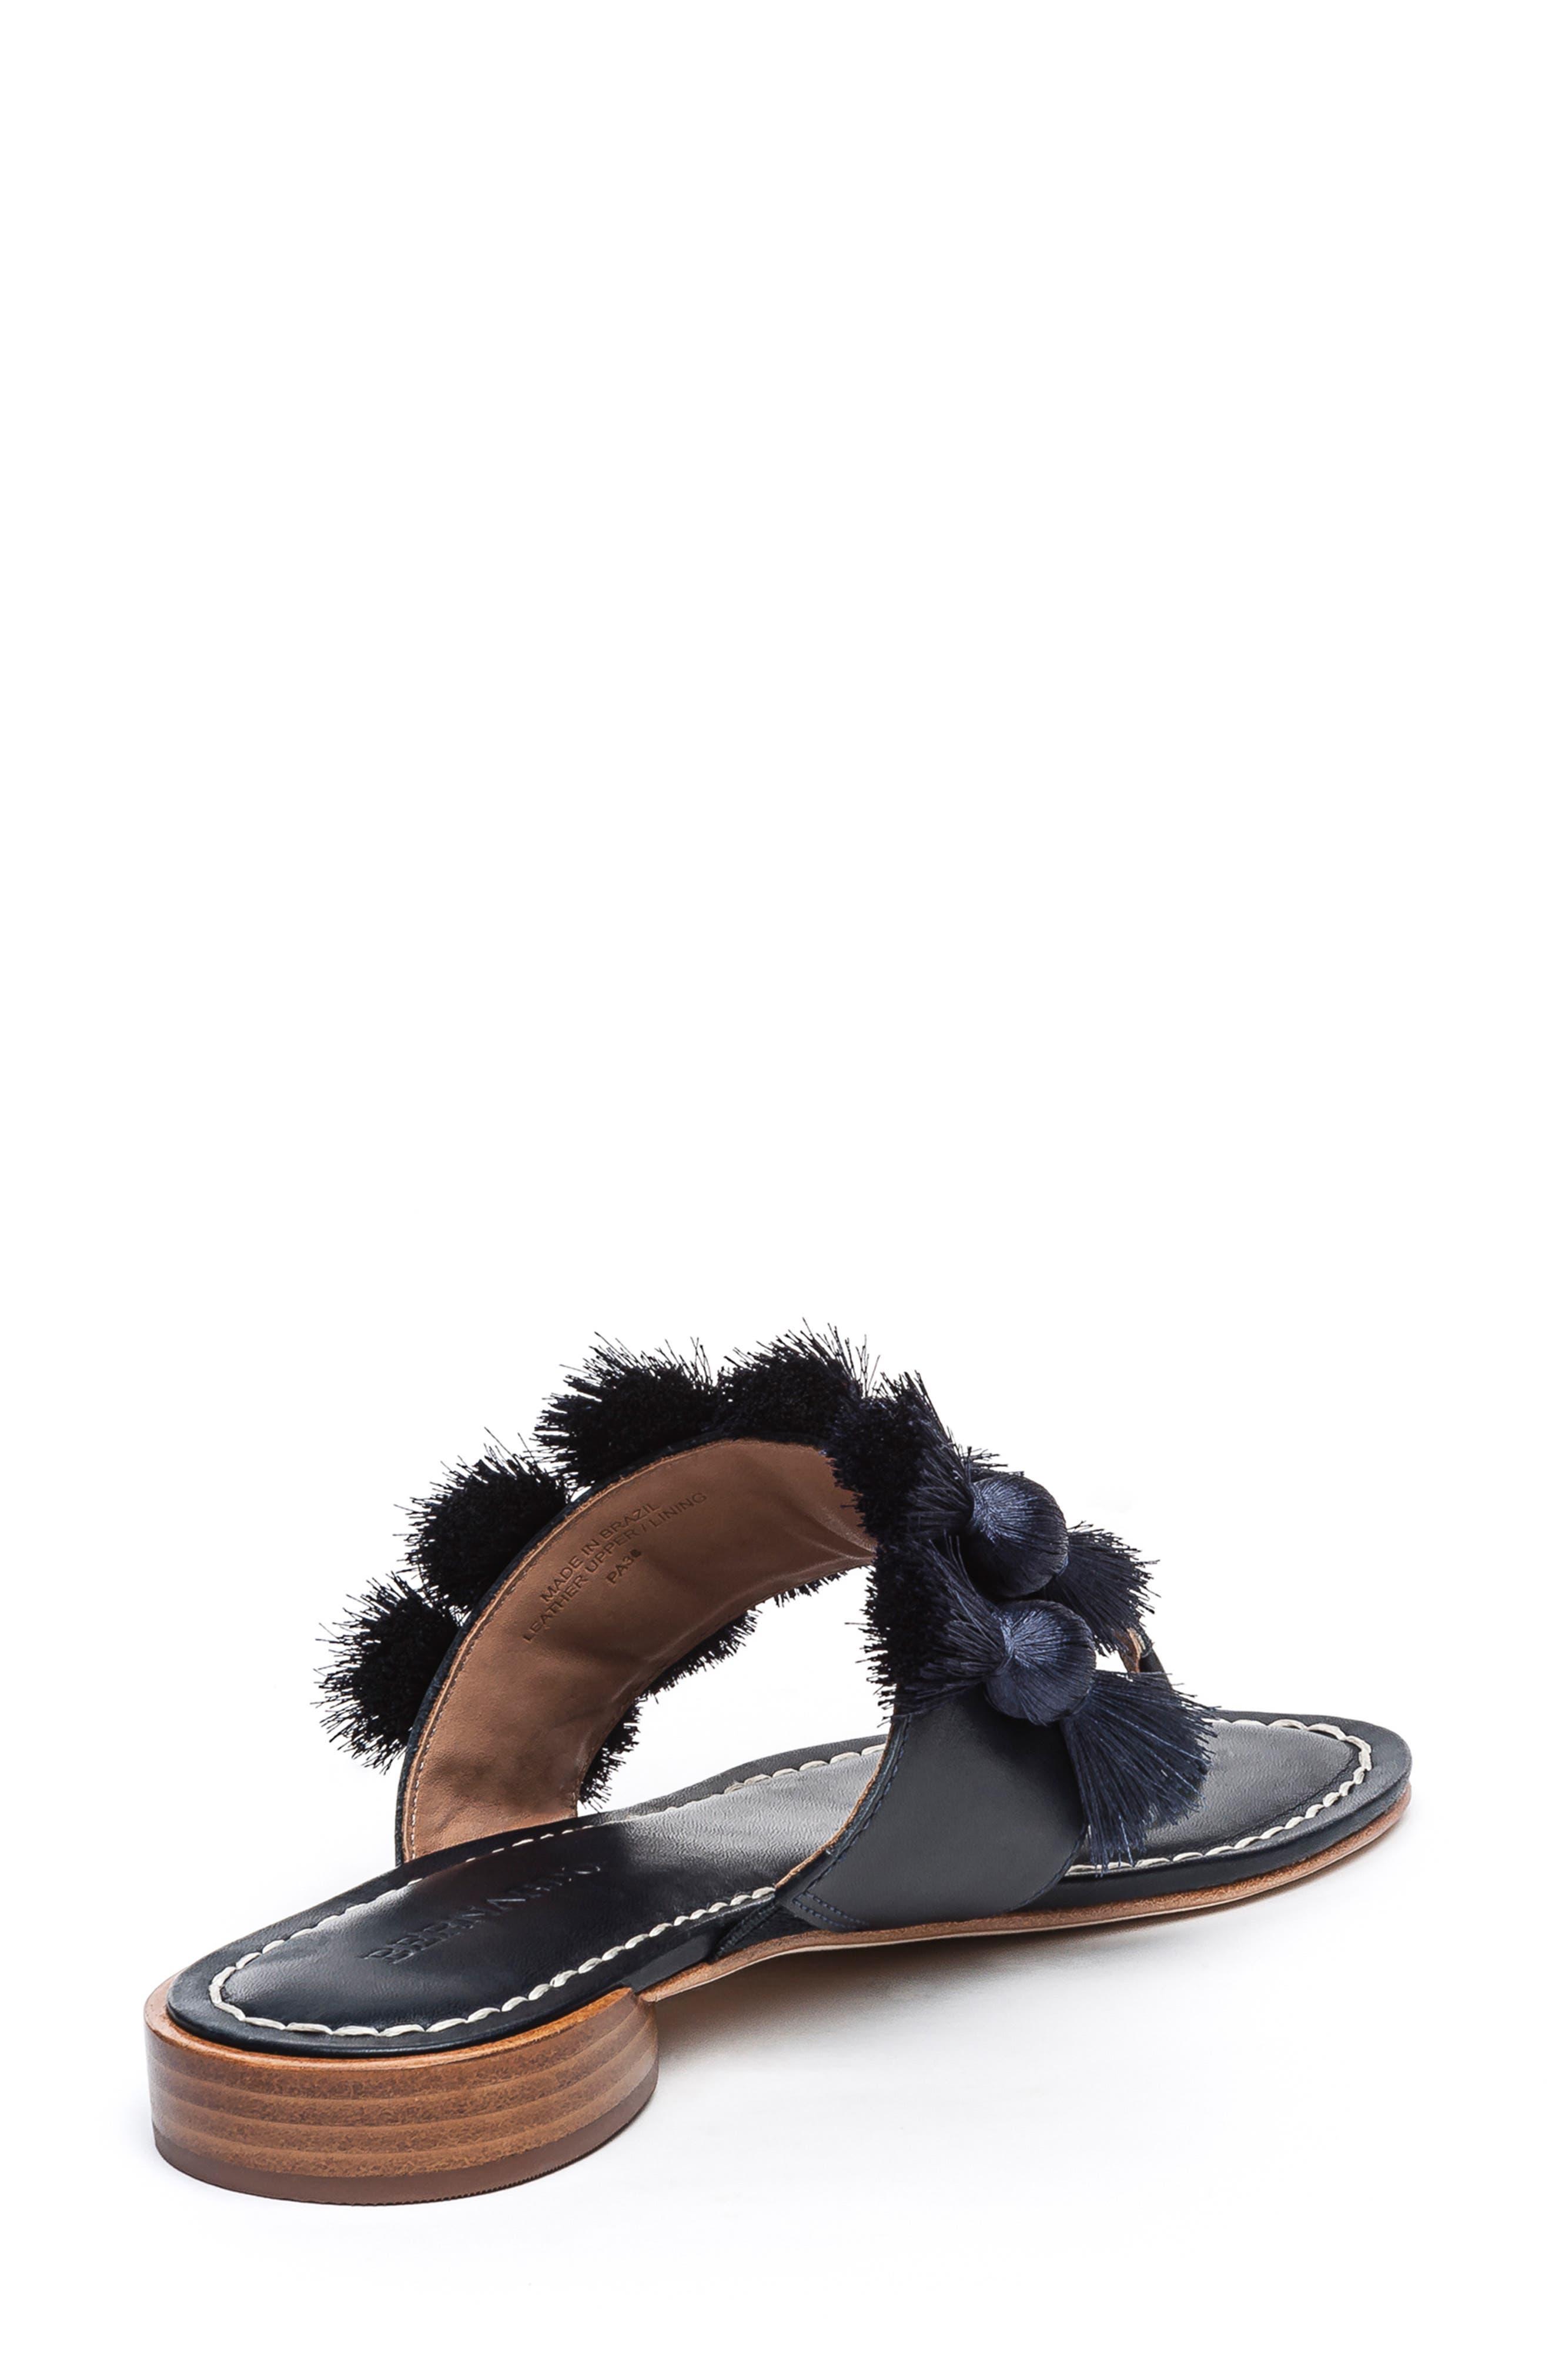 BERNARDO, Footwear Tara Flip Flop, Alternate thumbnail 2, color, NAVY ANTIQUE LEATHER